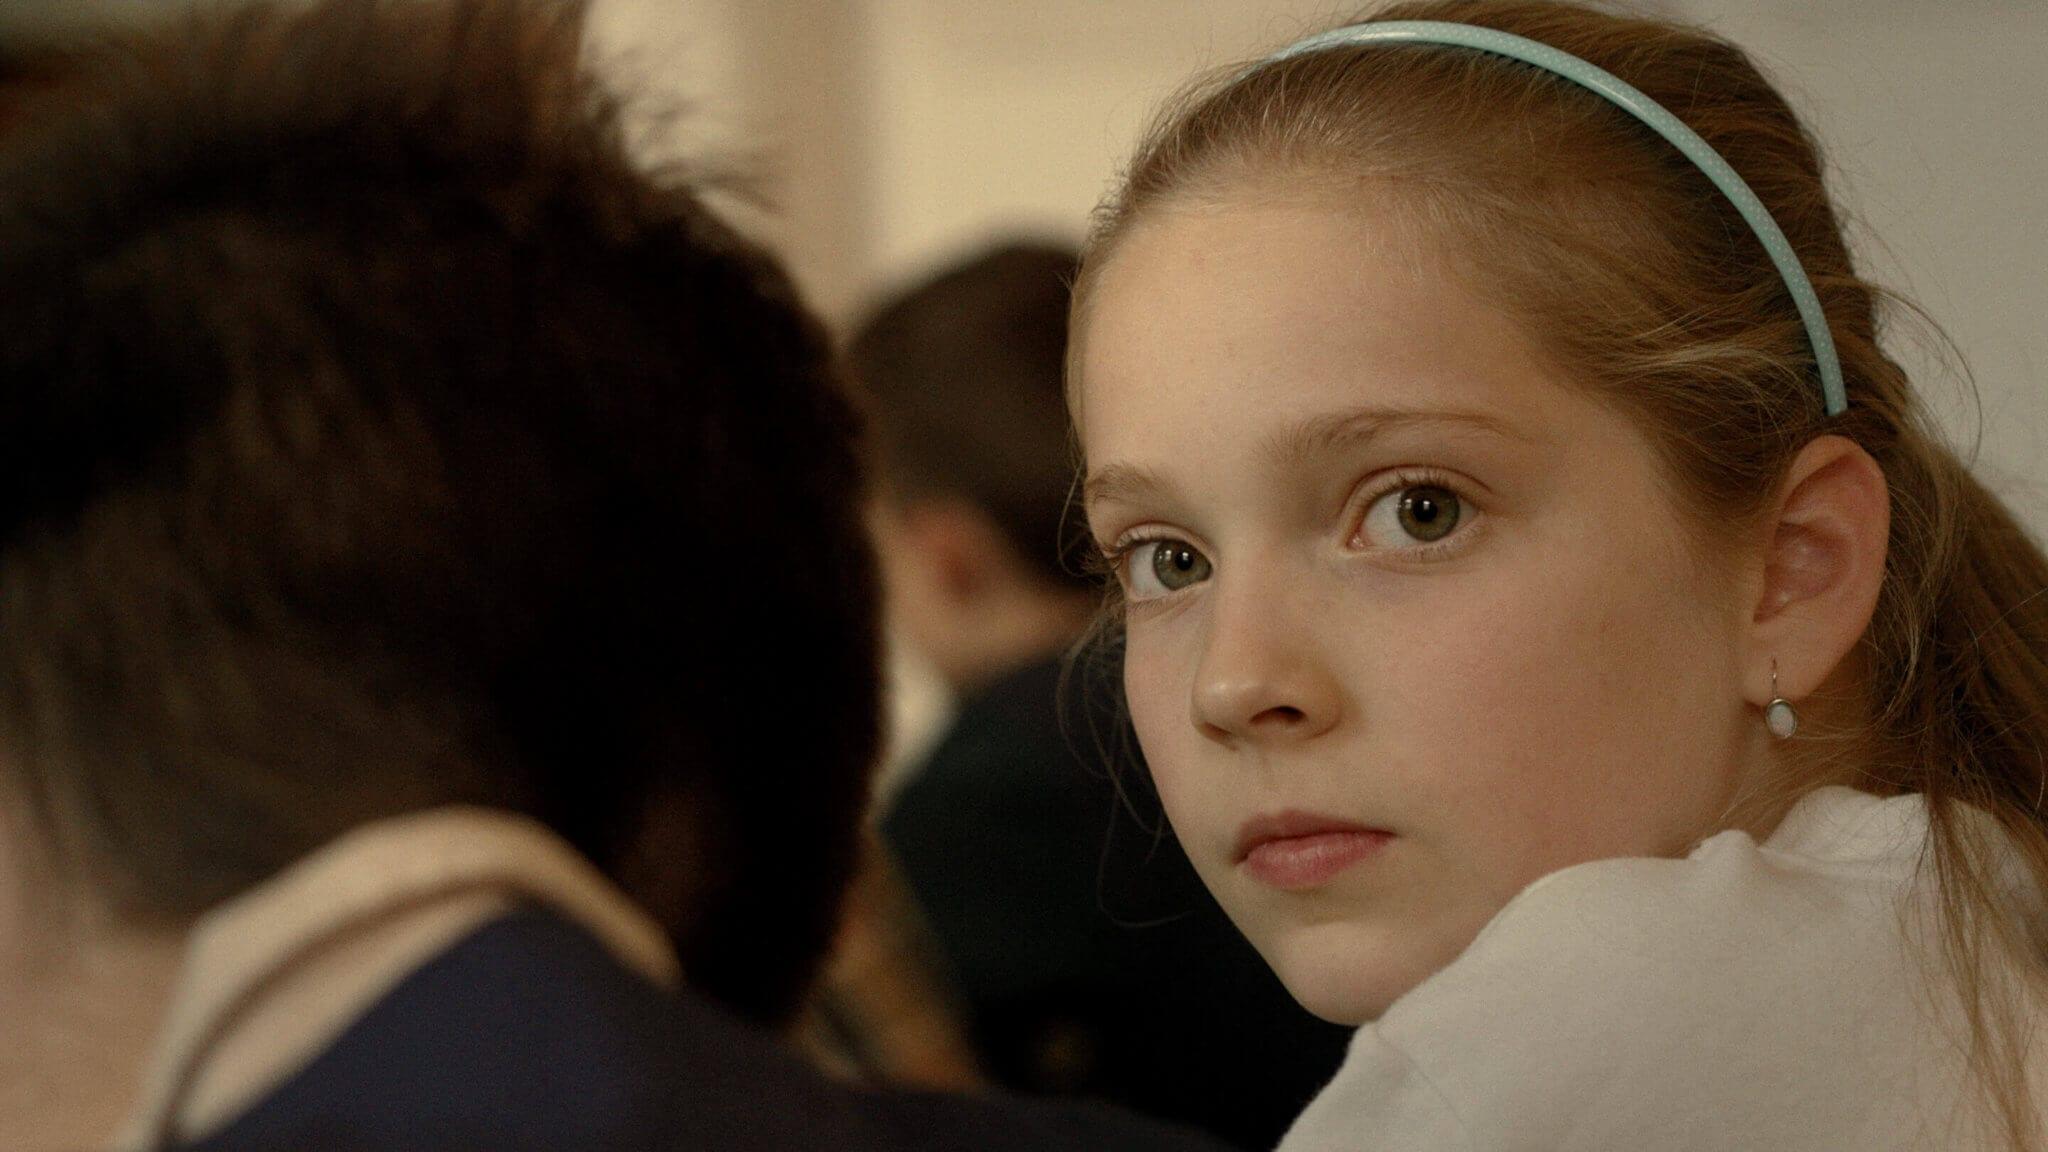 Sing (Mindenki) - Oscar Shortlisted Short Film - Review - Indie Shorts Mag 2